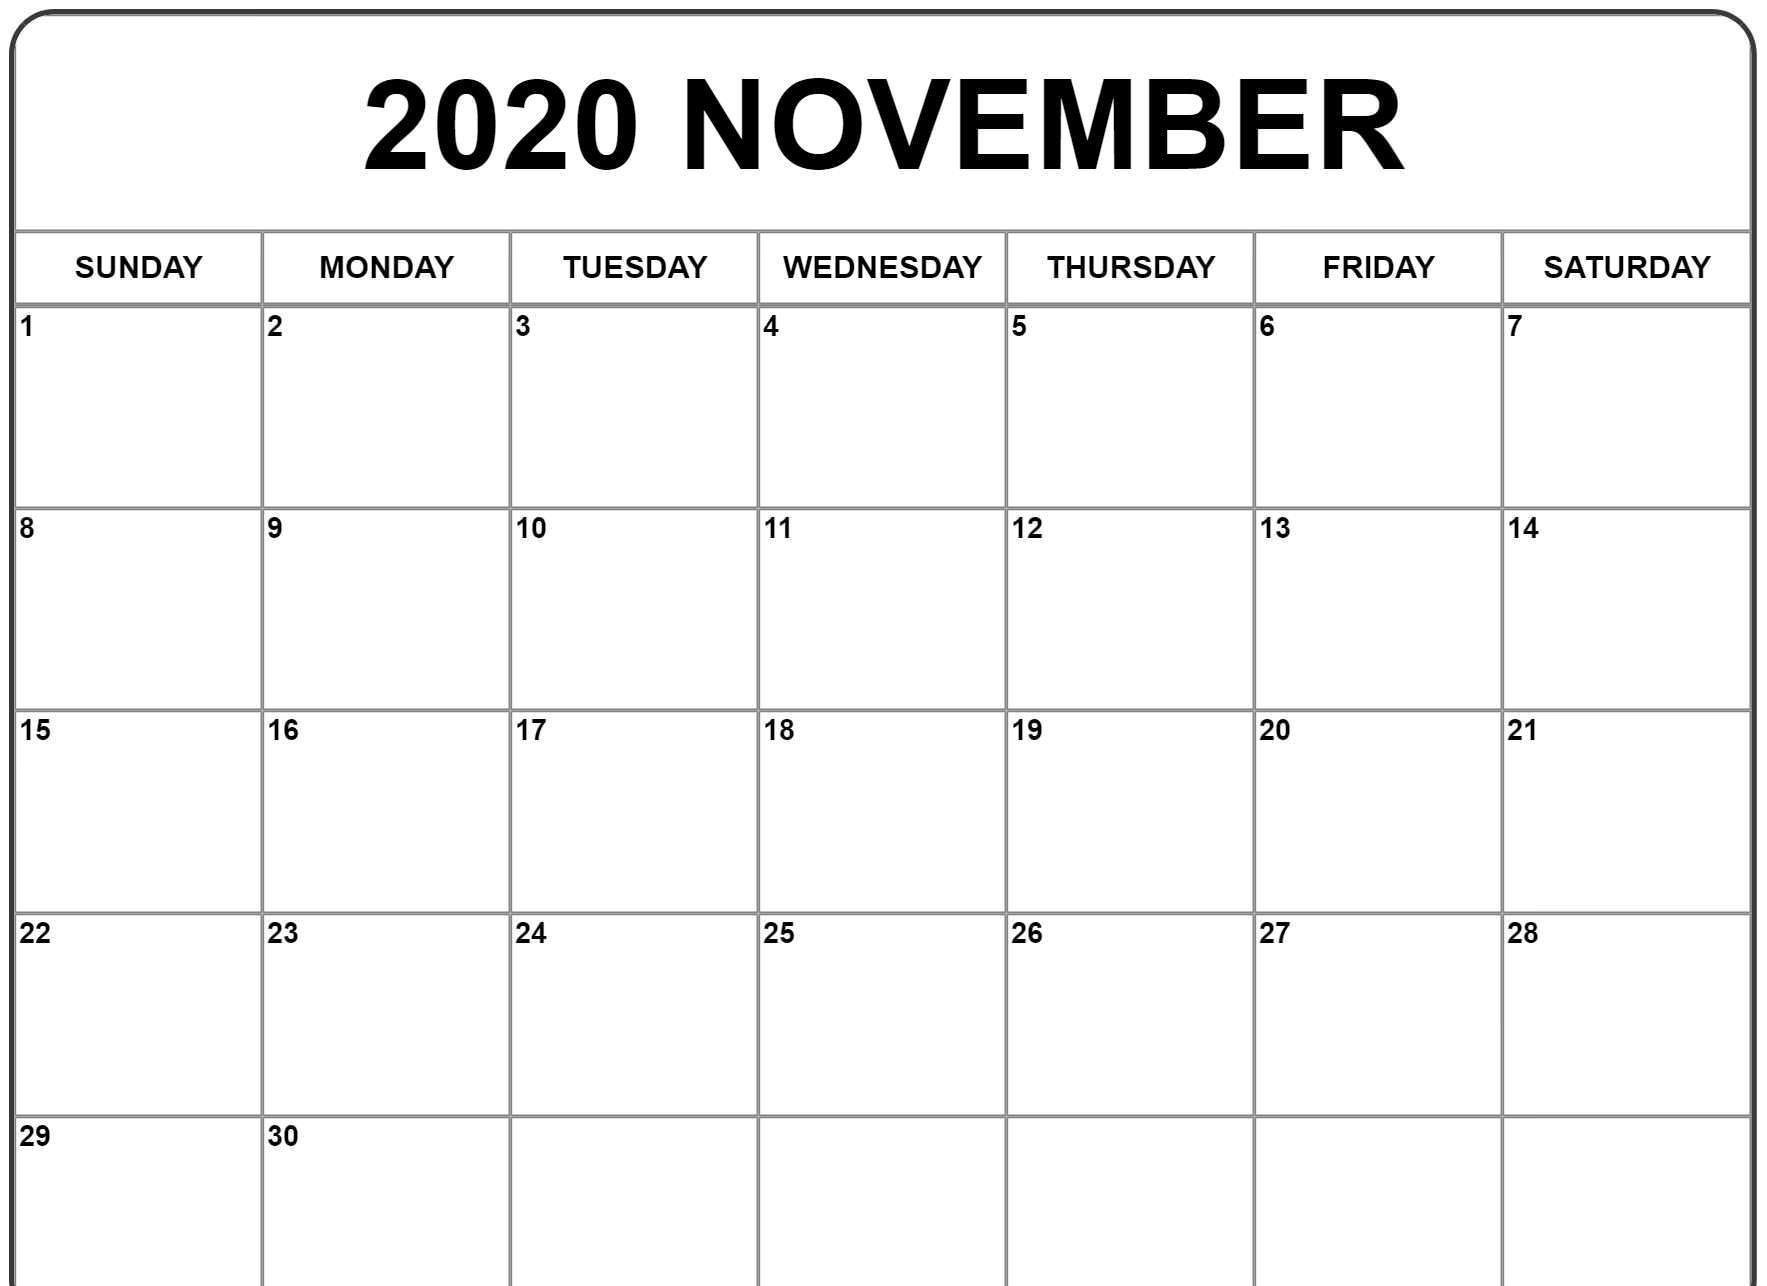 November 2020 Calendar Wallpapers - Top Free November 2020 regarding Bring Up Calander For October And November 2020